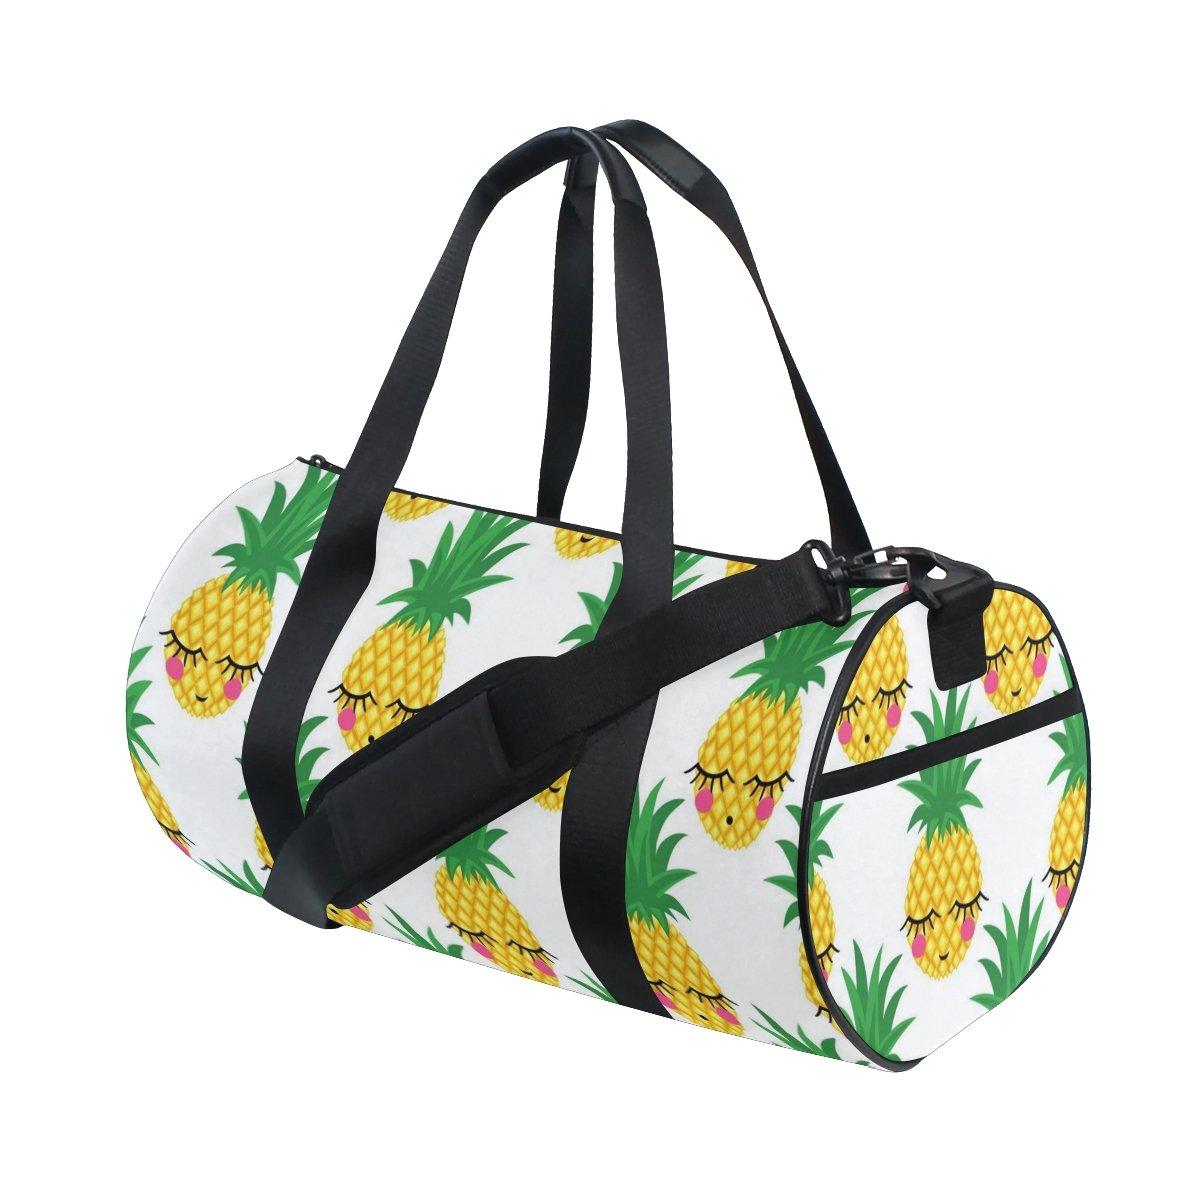 Naanle Smile Sleeping Pineapple Pattern Gym bag Sports Travel Duffle Bags for Men Women Boys Girls Kids